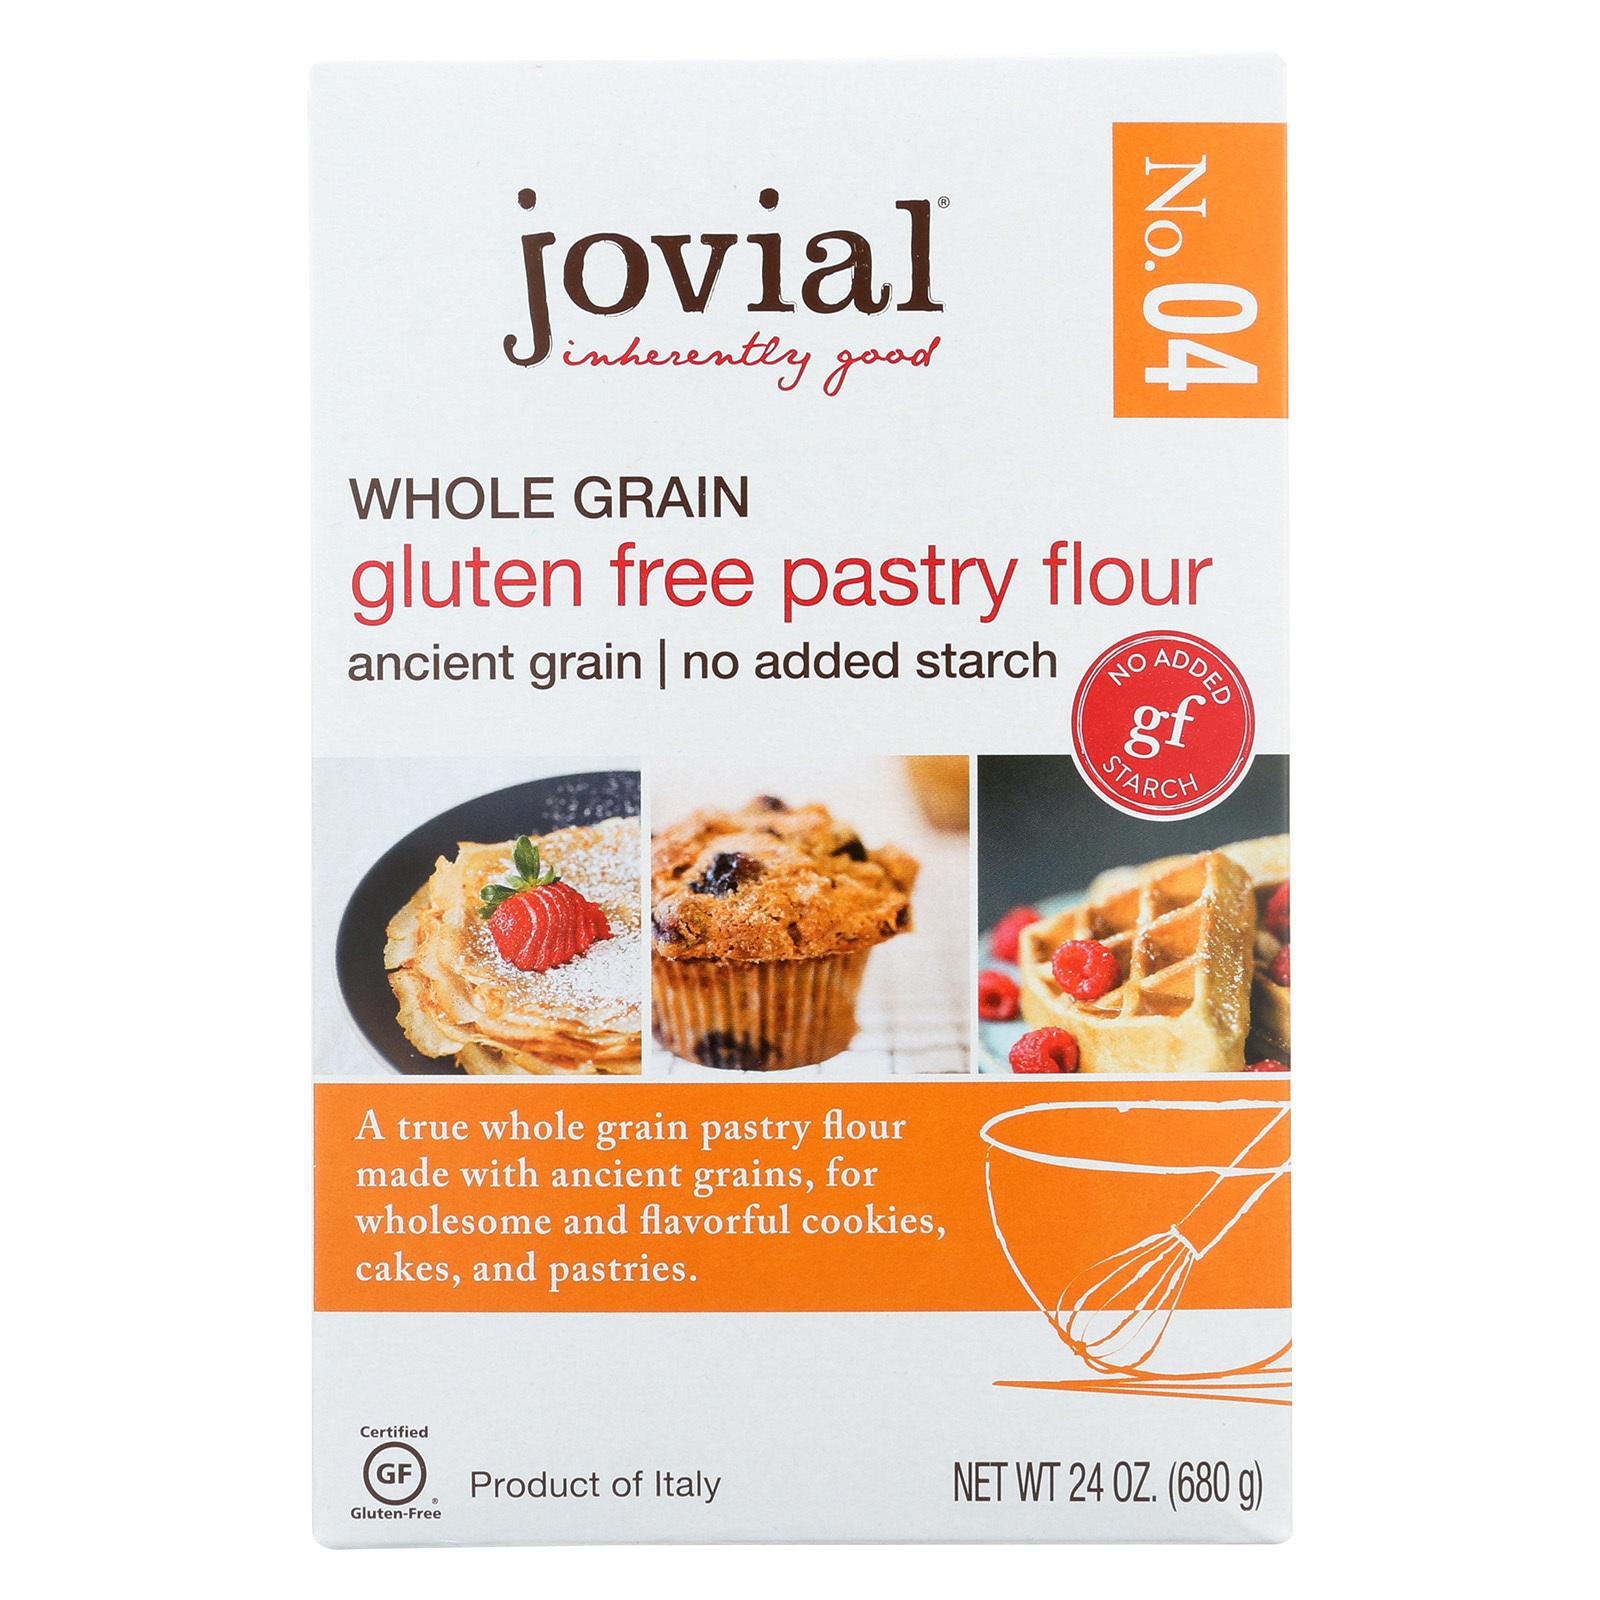 Jovial Gluten Free Pastry Flour - Whole Grain - Case of 6 - 24 oz.